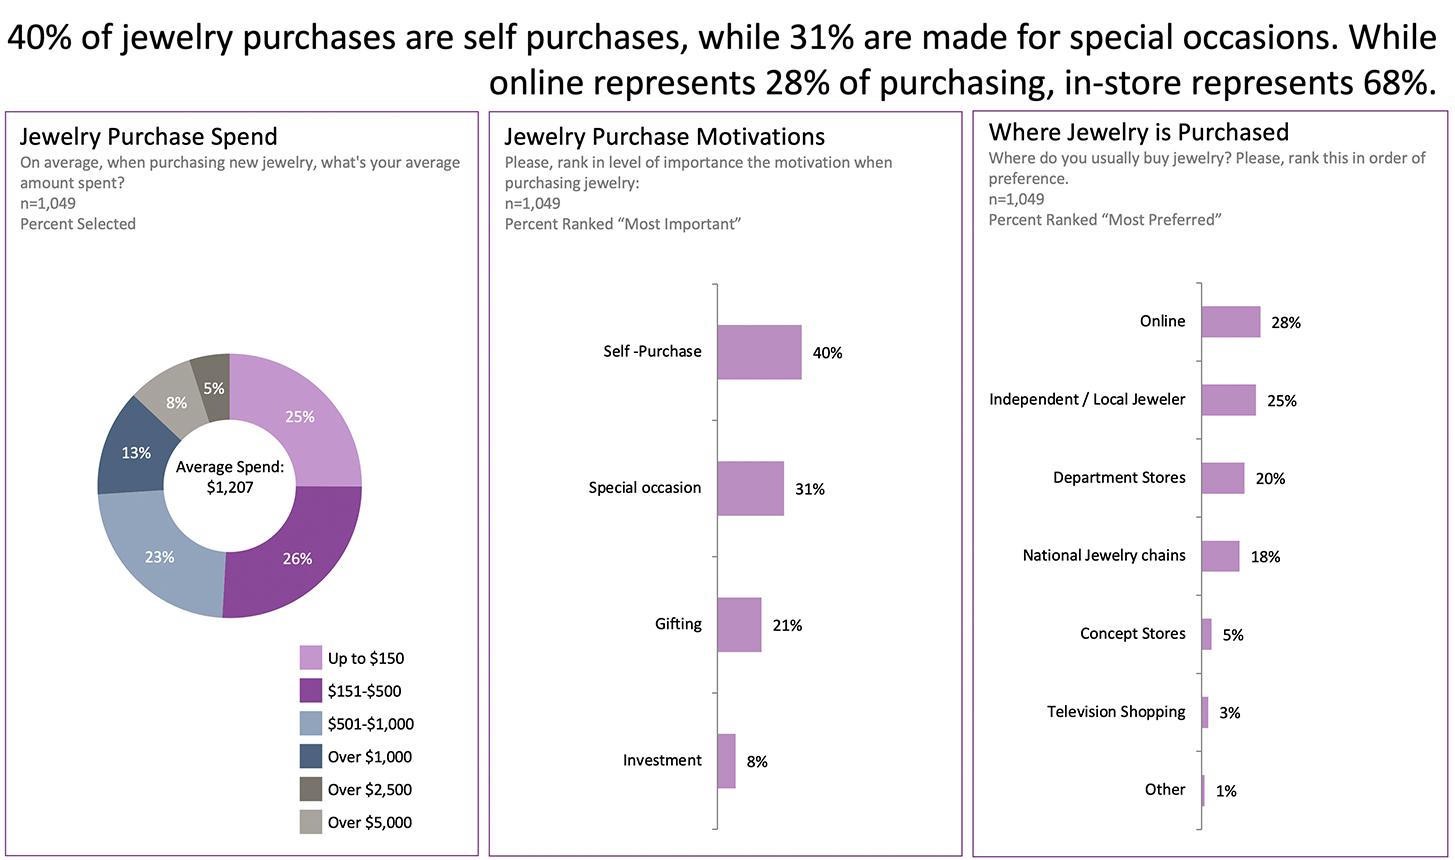 Groundbreaking Consumer Study Identifies Primary Factors in Jewelry Purchases